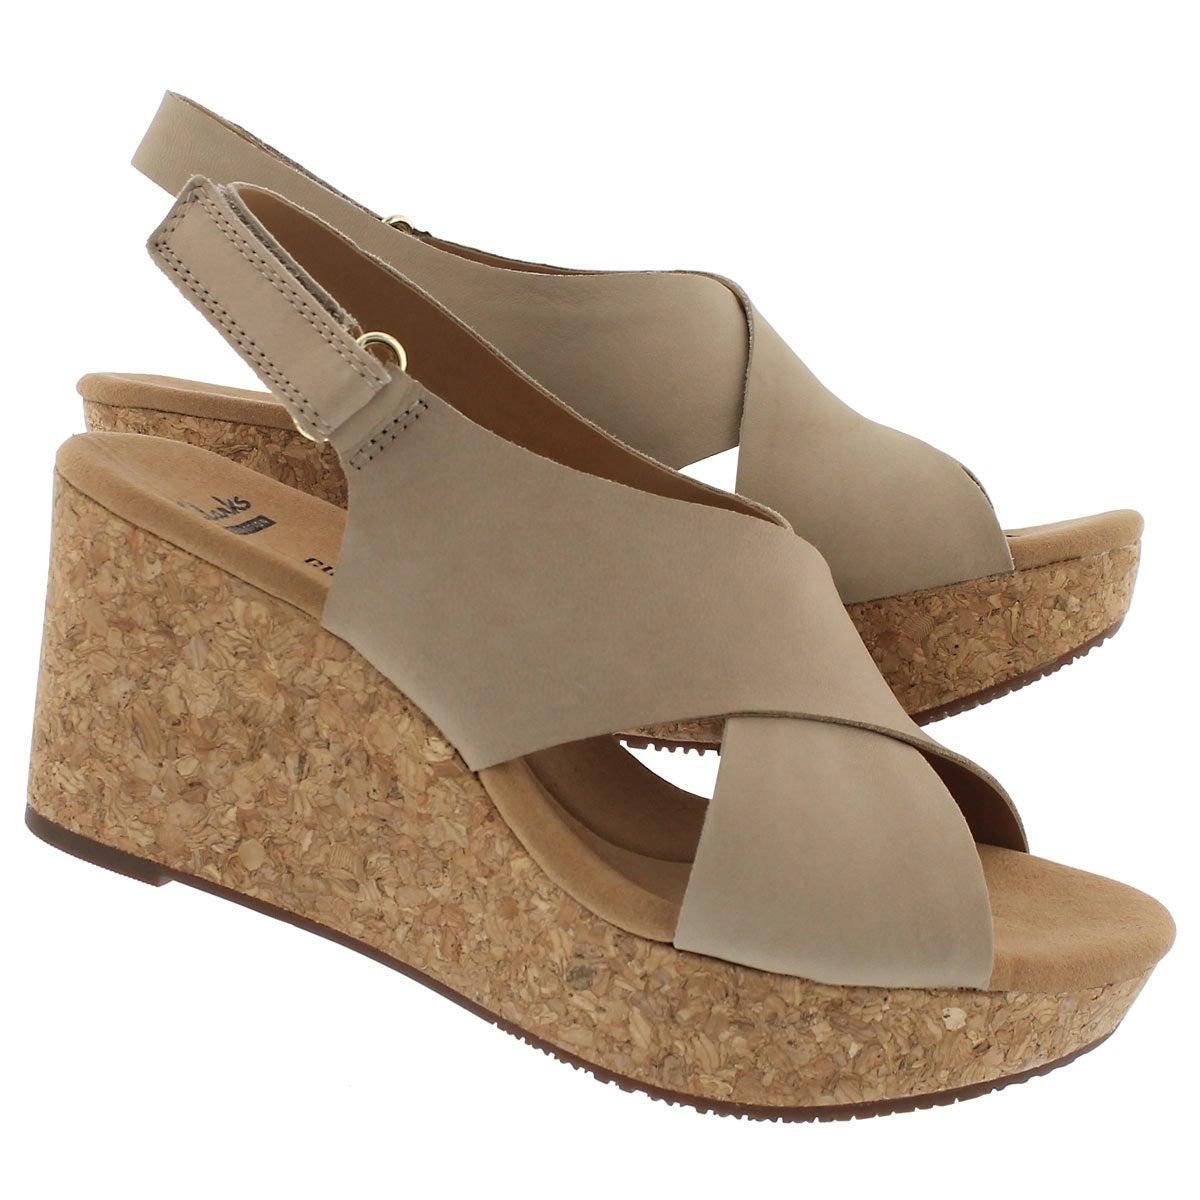 Lds Annadel Eirwyn sand wedge sandal